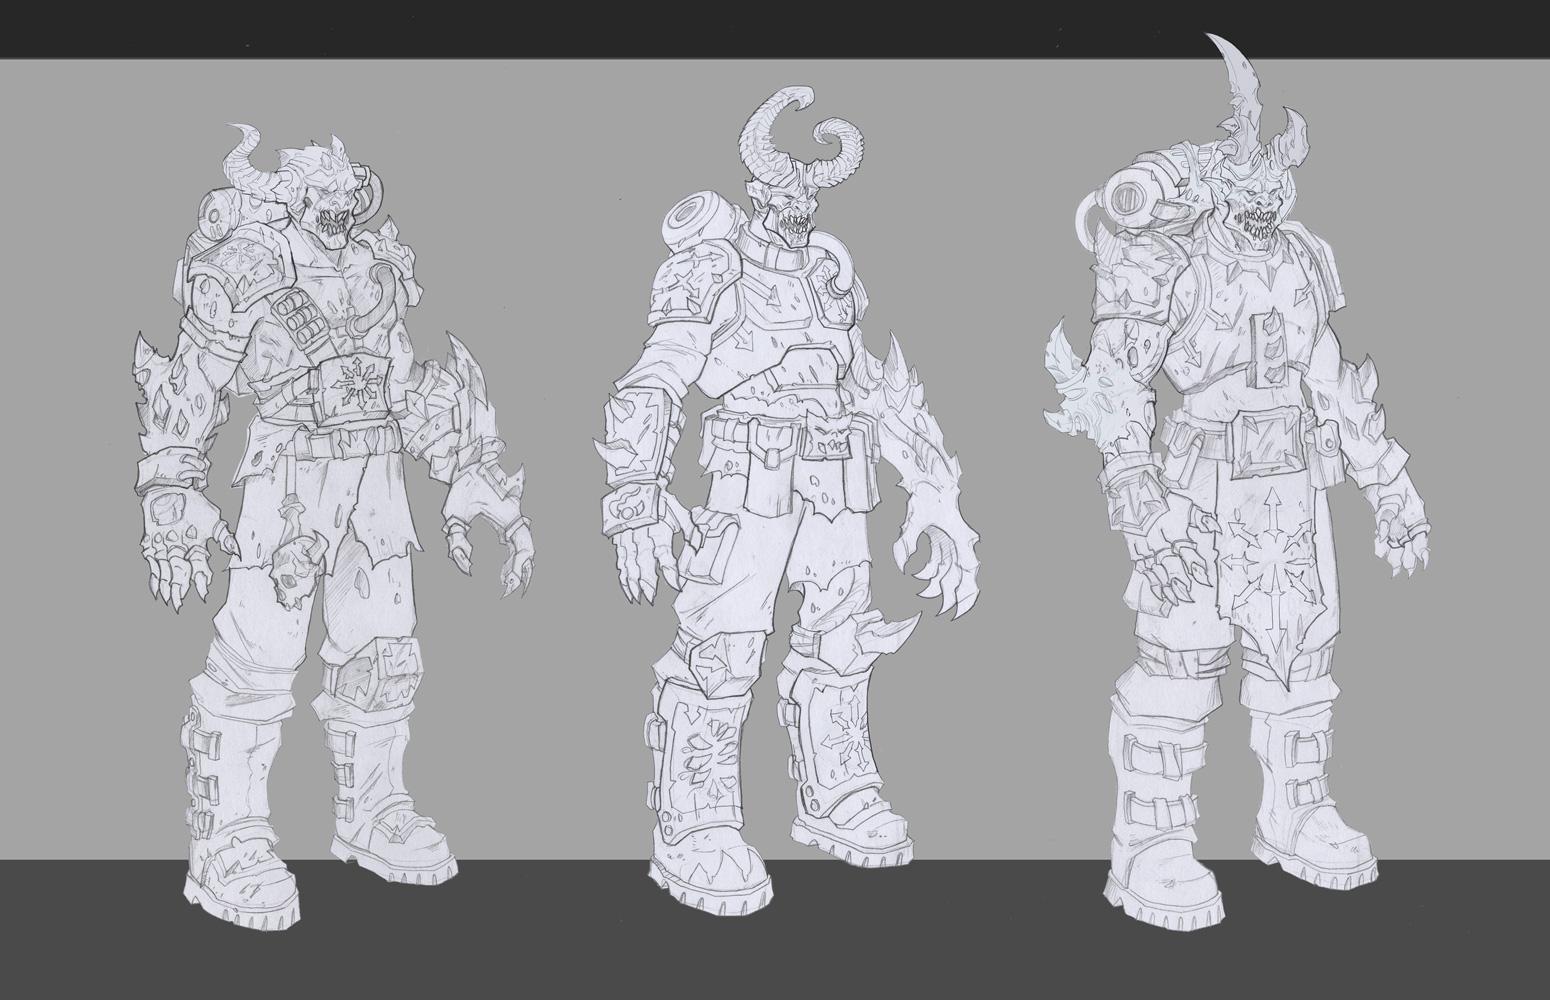 [E3] Eternal Crusade, un MMO Warhammer 40K - Page 3 24